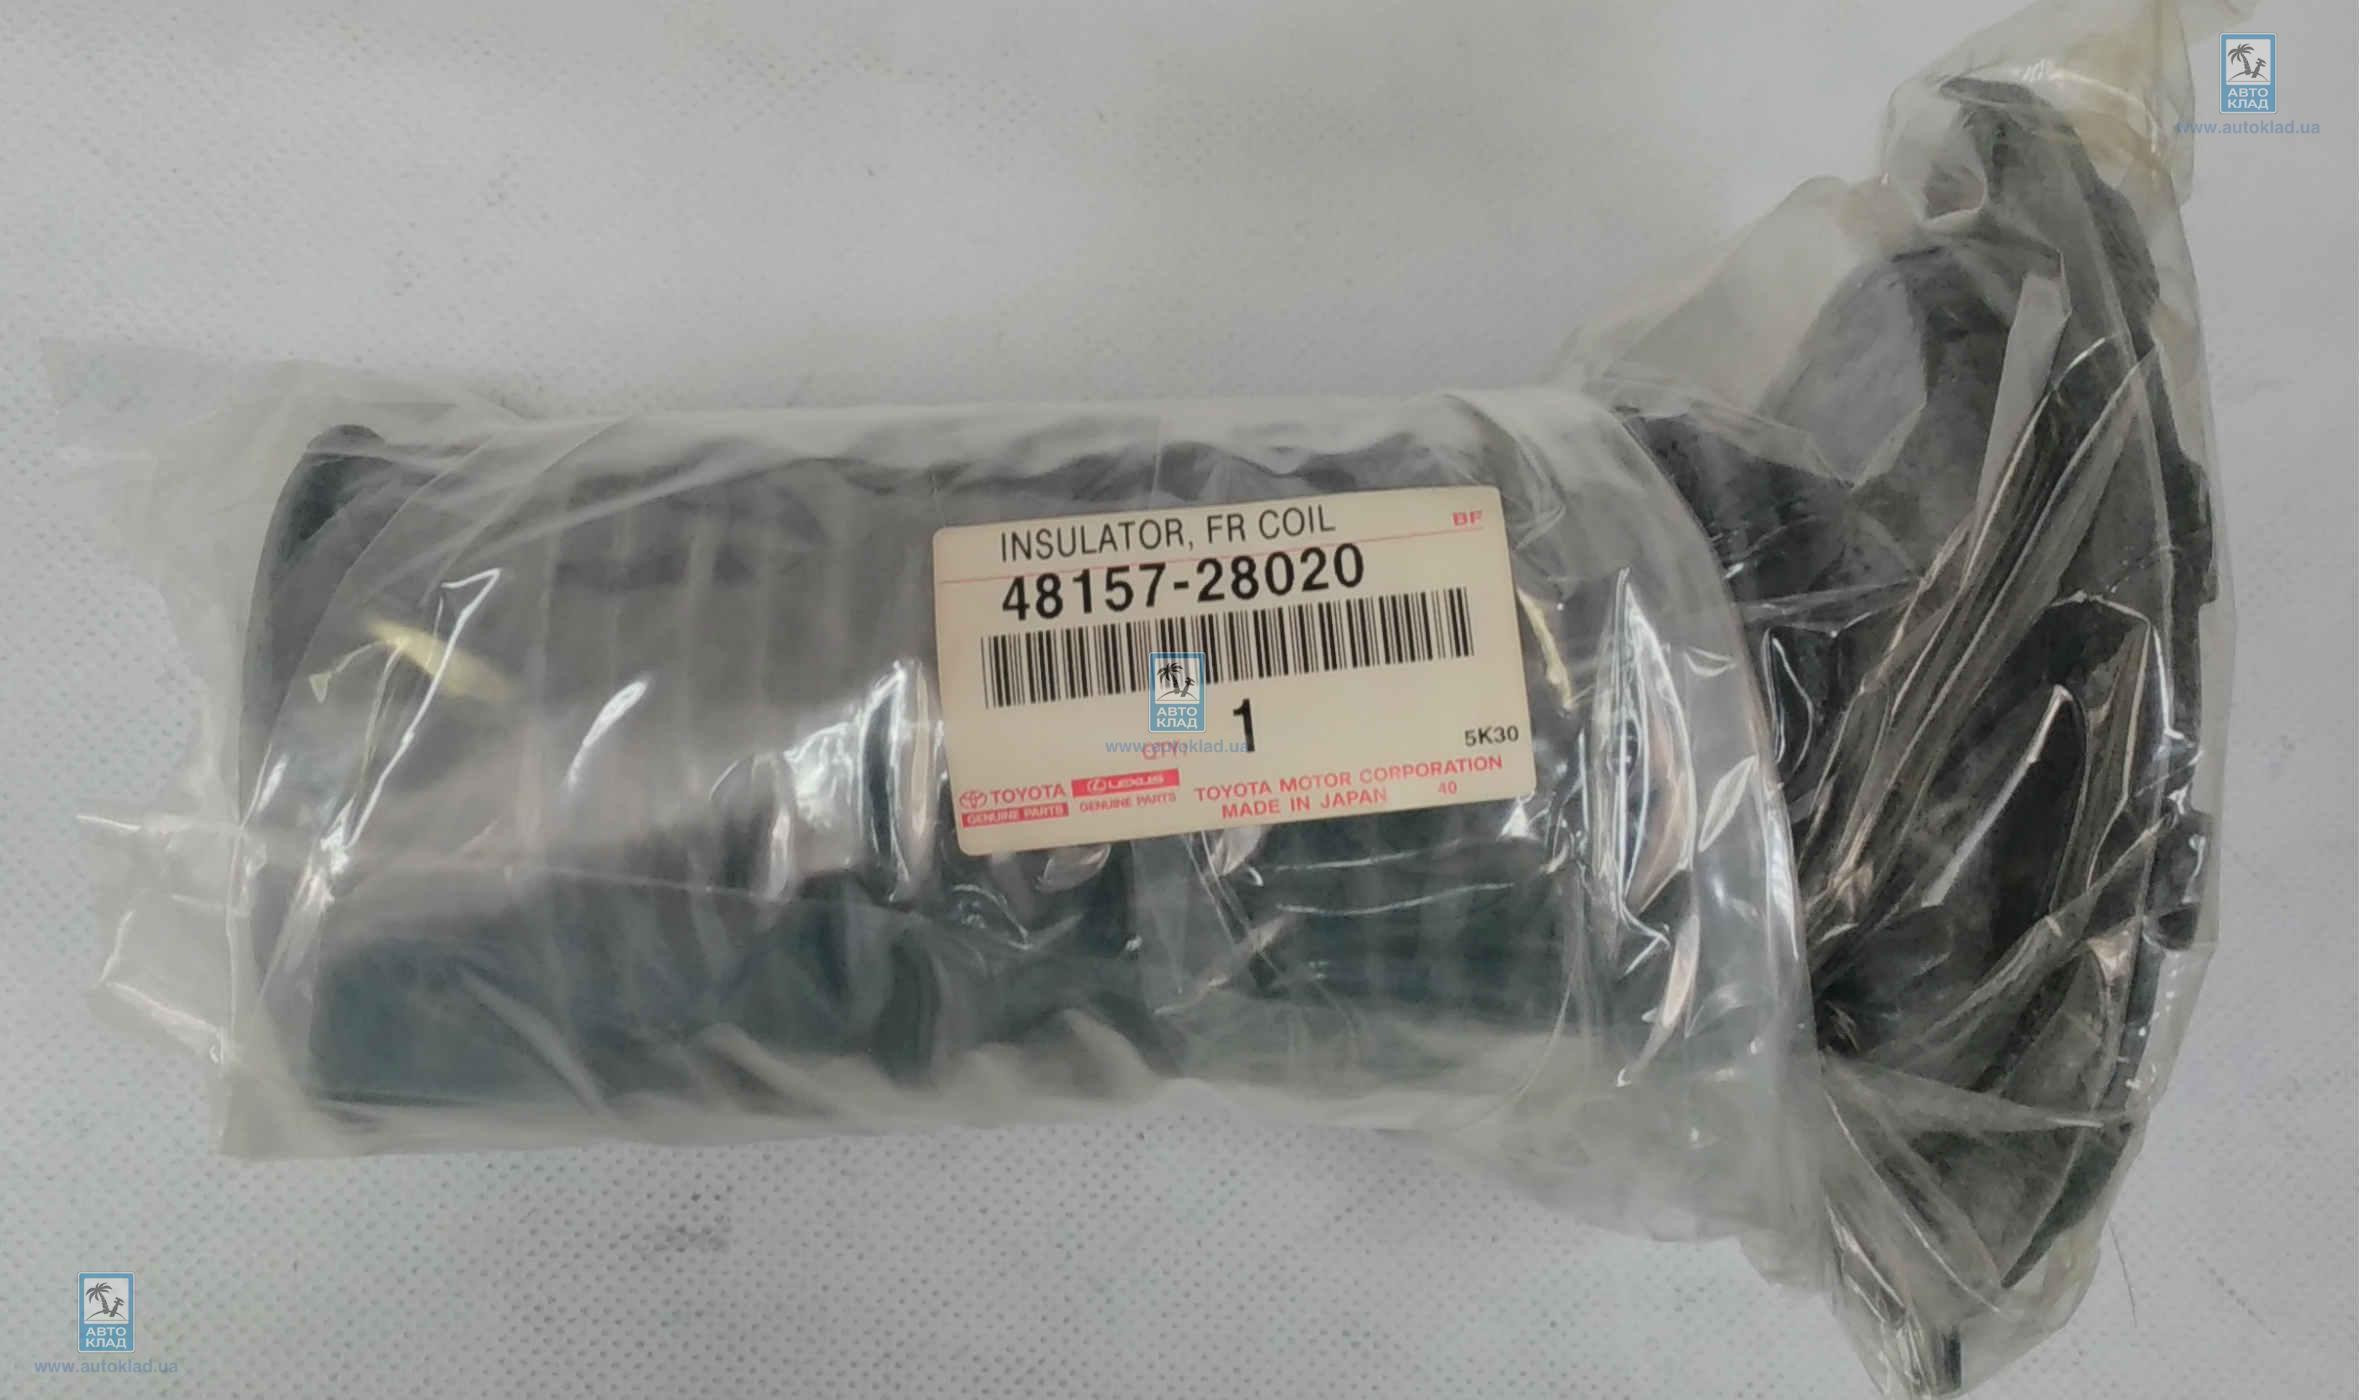 Пыльник амортизатора TOYOTA 4815728020